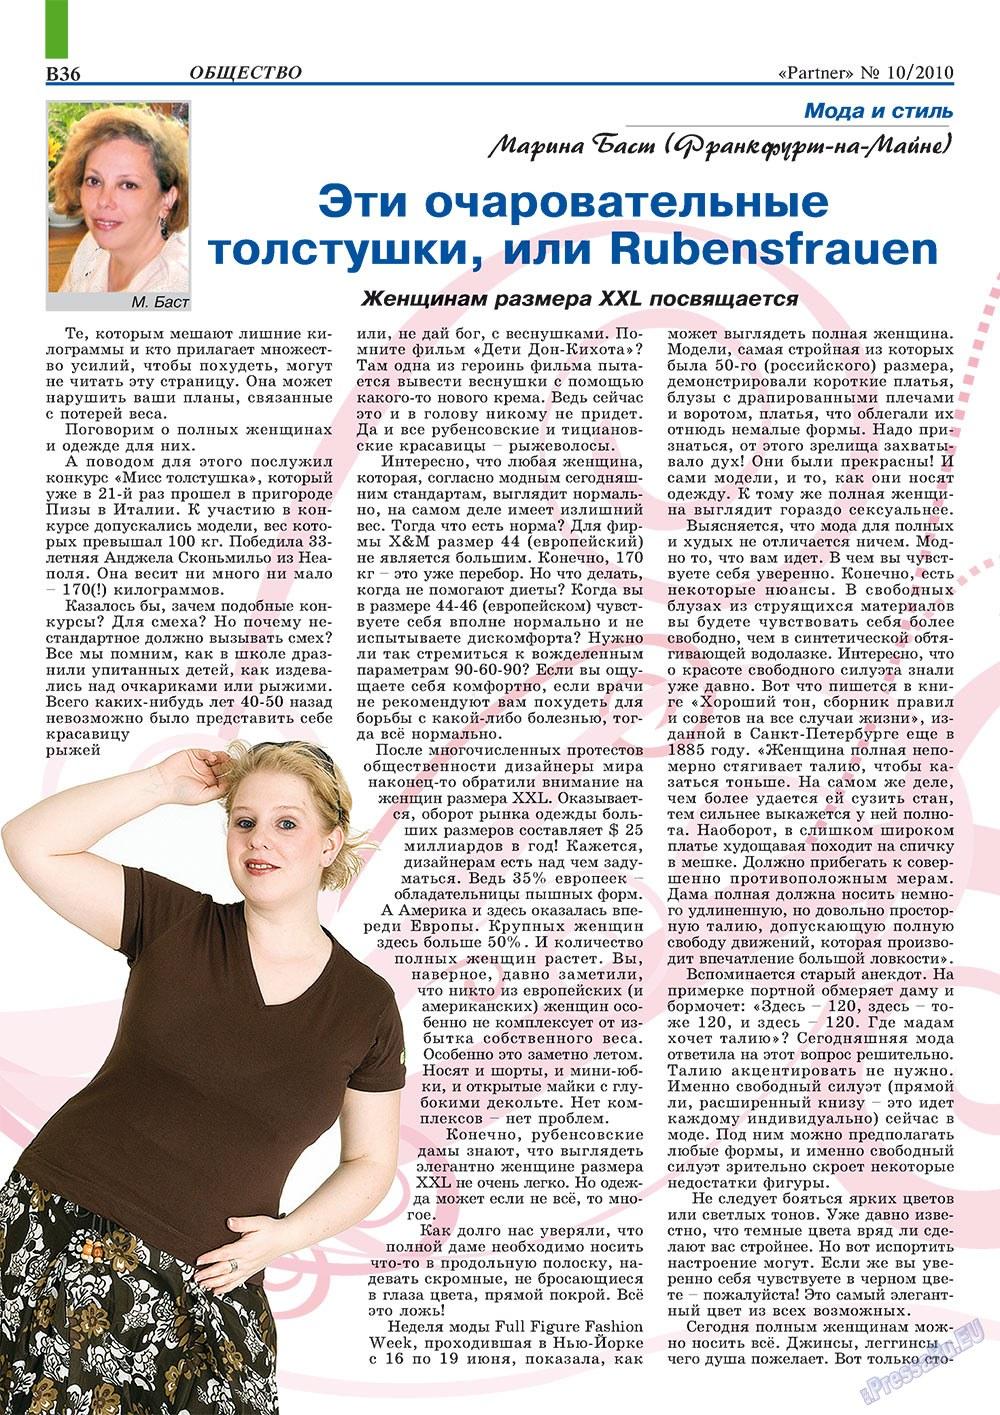 Партнер-север (журнал). 2010 год, номер 10, стр. 46